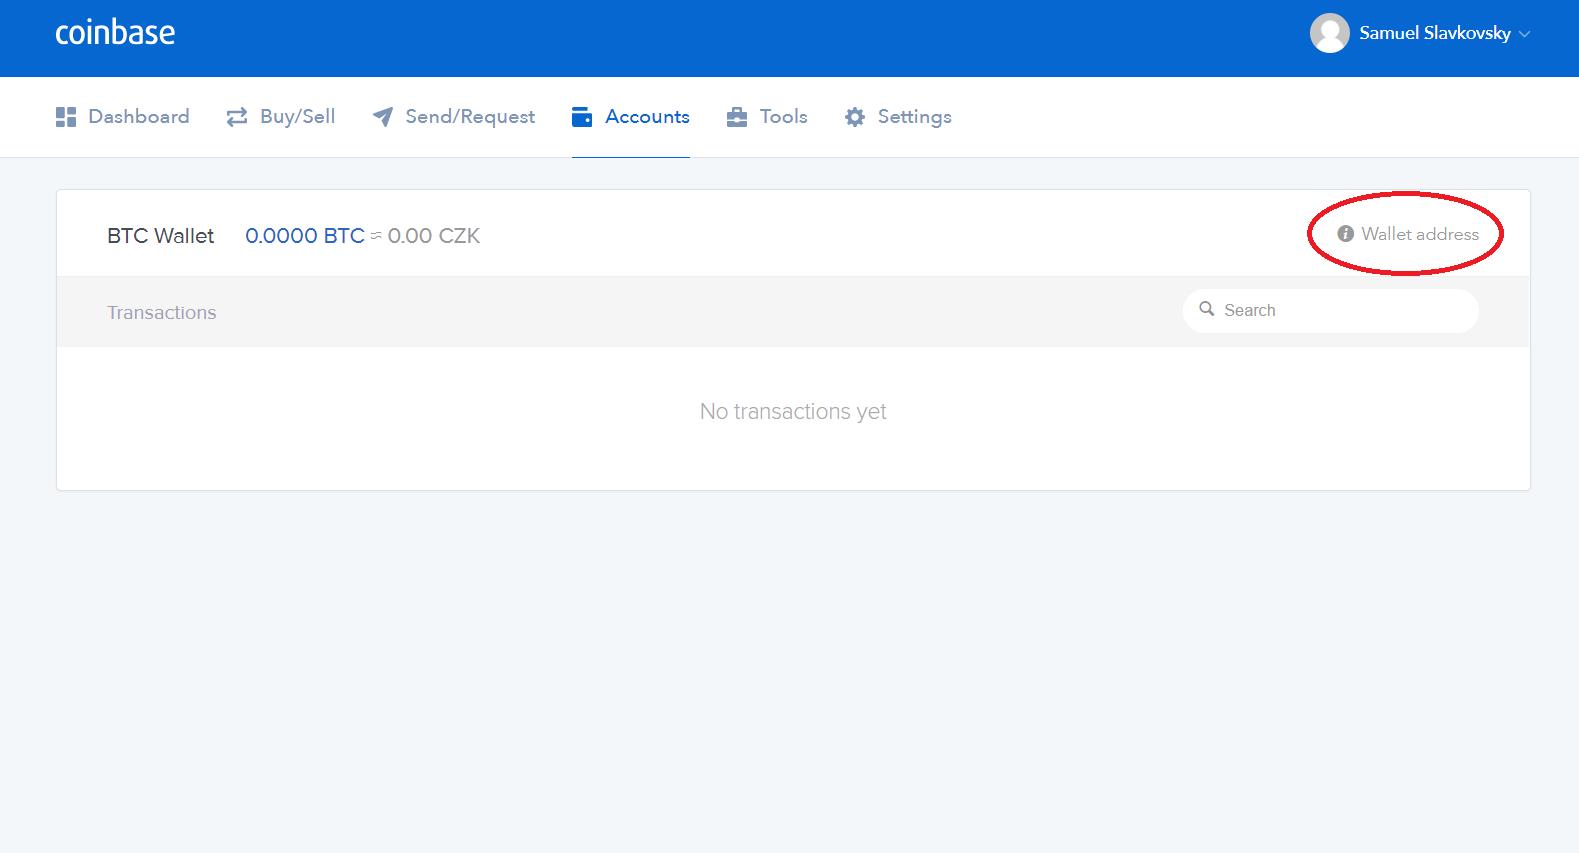 coinbase adresa wallet